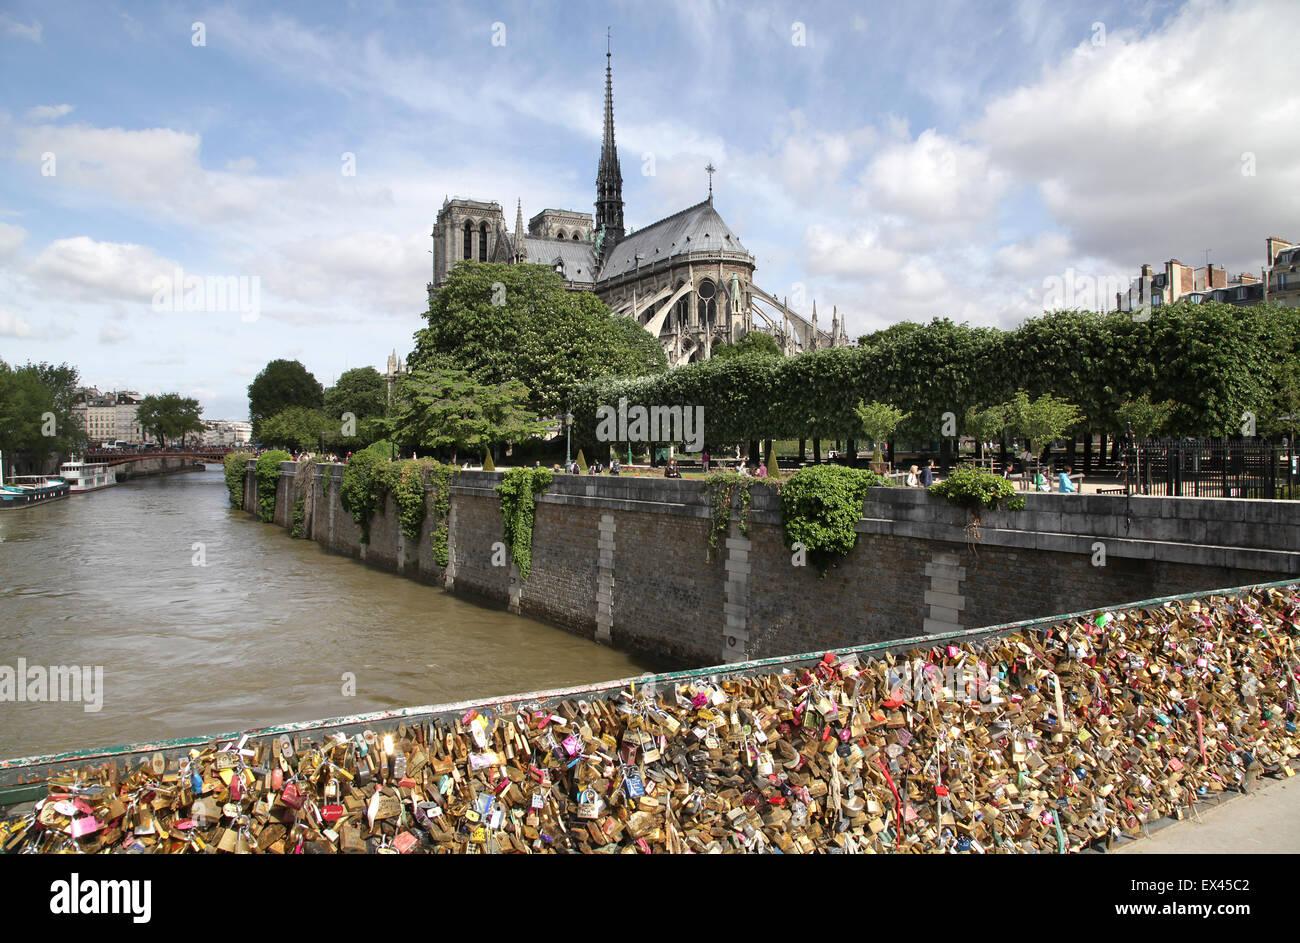 Pont des Arts.Love lock bridge.Love locks.Paris.France - Stock Image